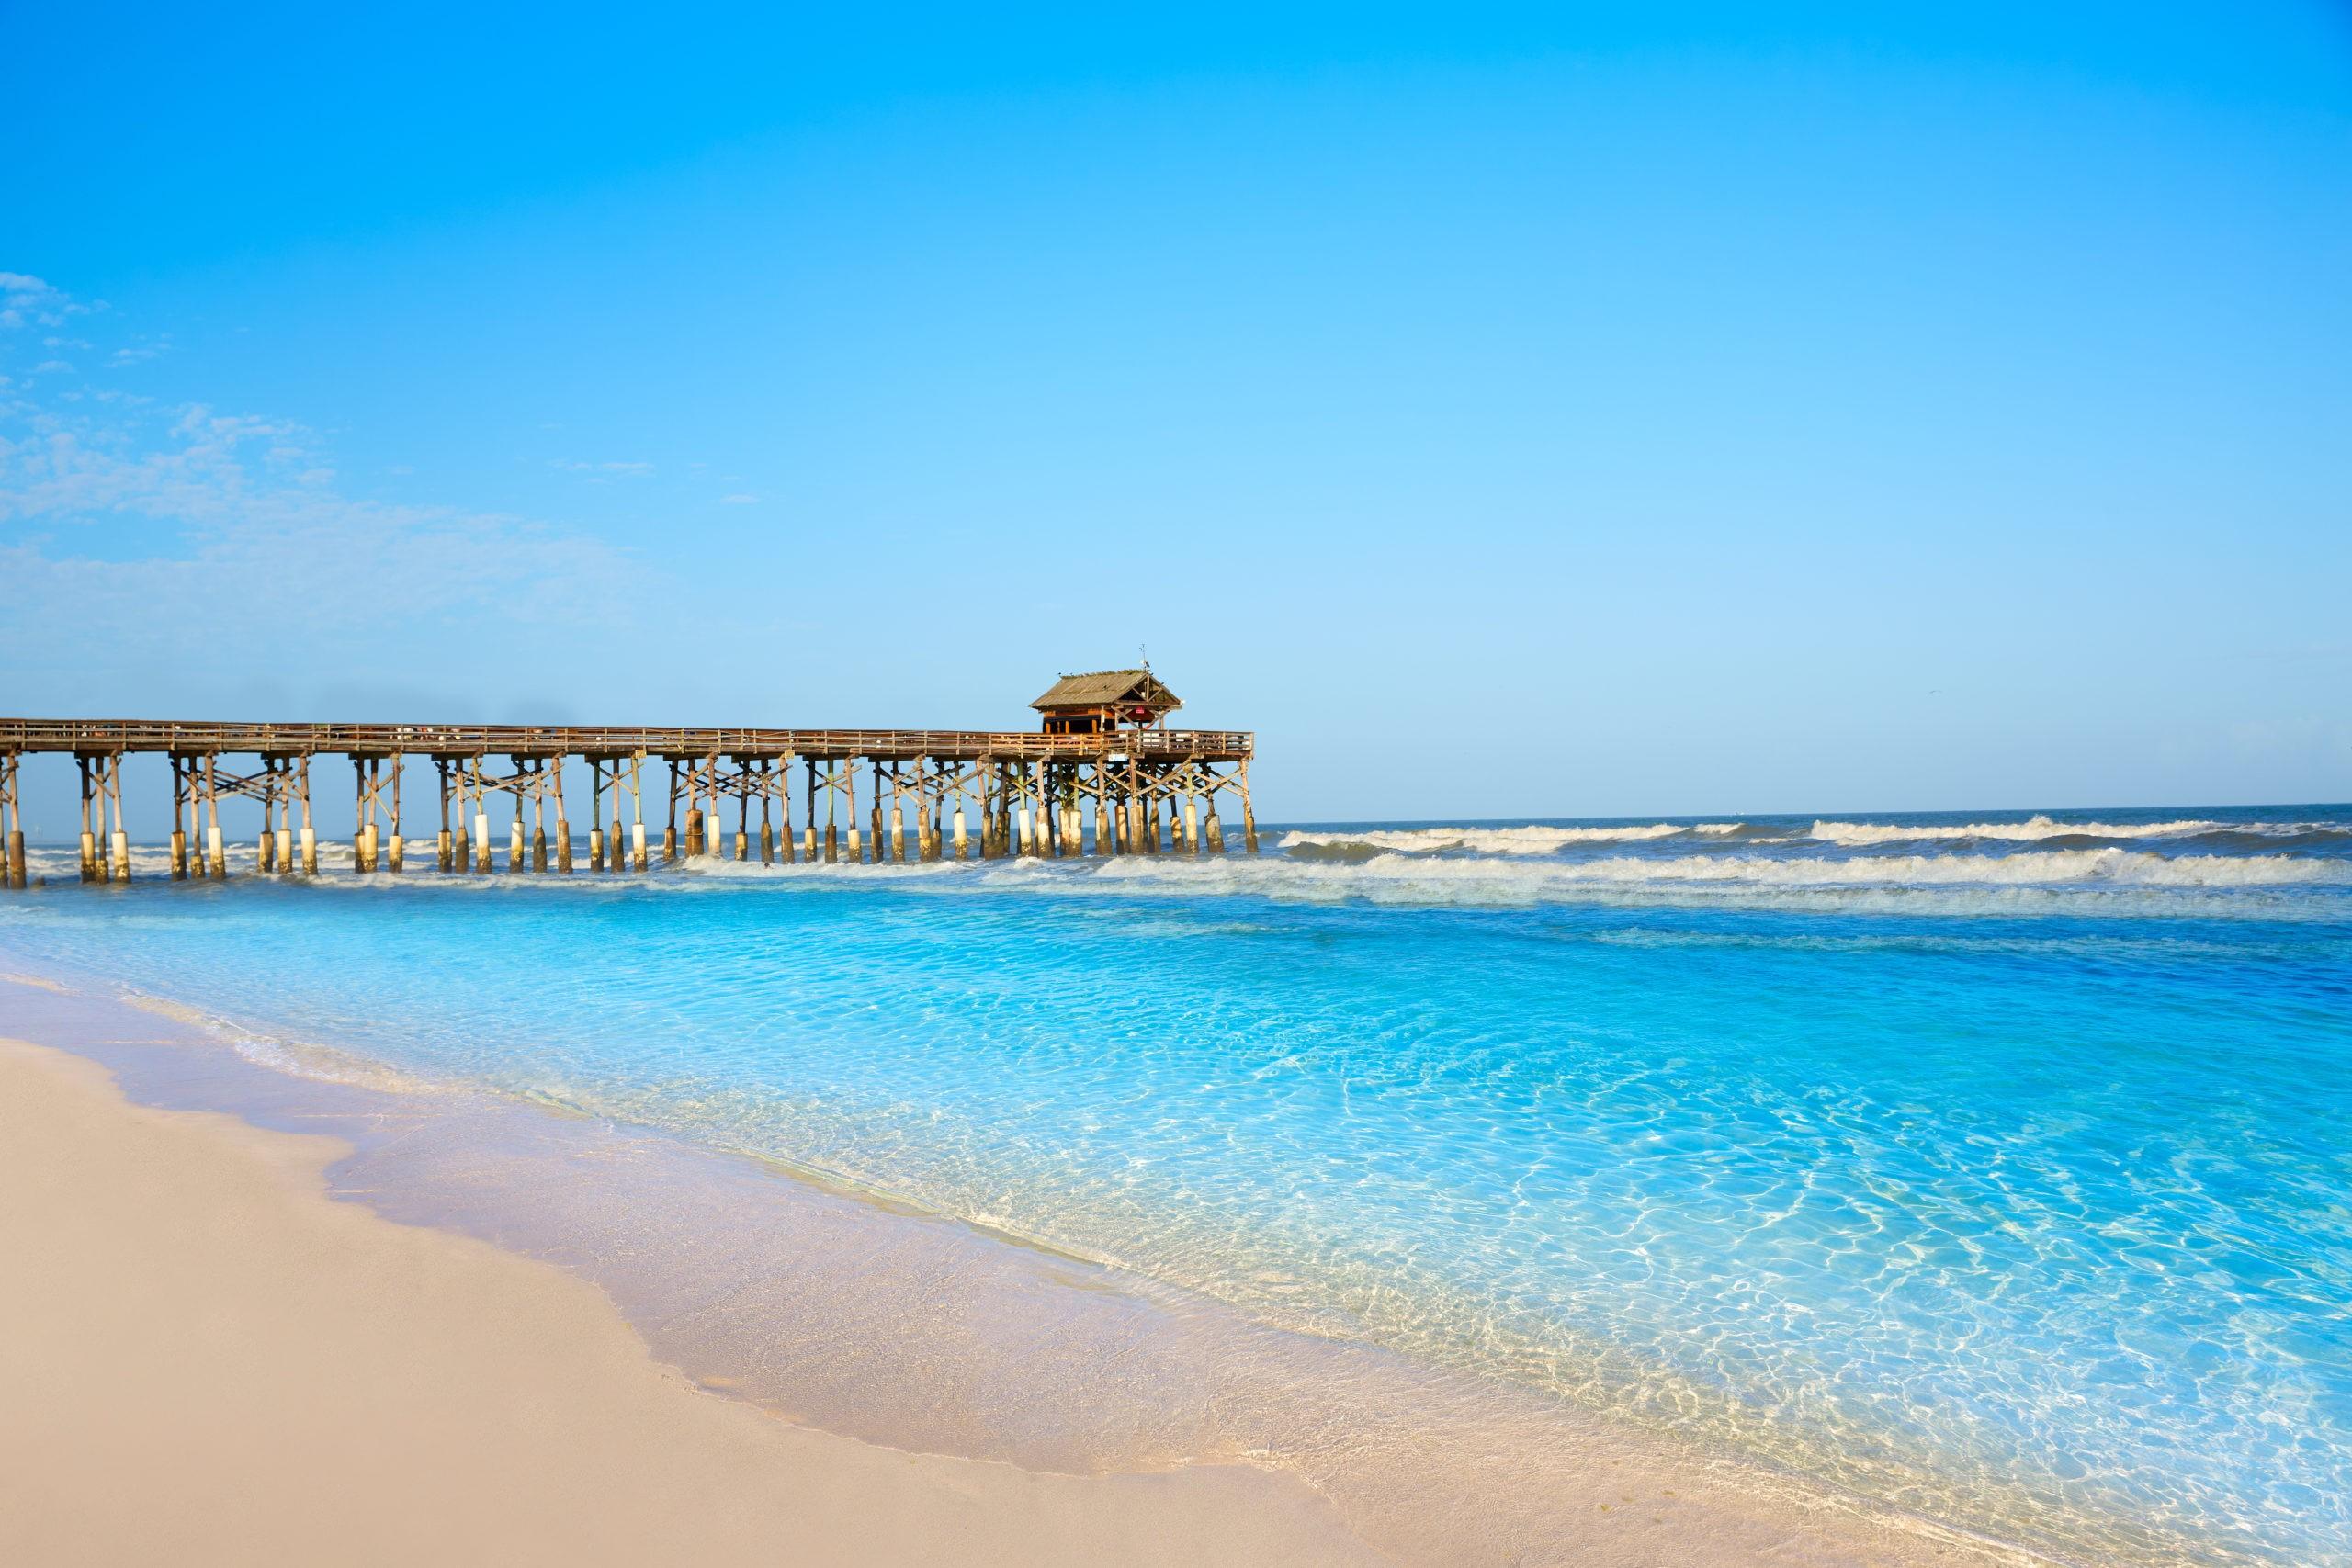 Cocoa Beach molo w Cape Canaveral na Florydzie w pobliżu Orlando, licencja: shutterstock/By lunamarina